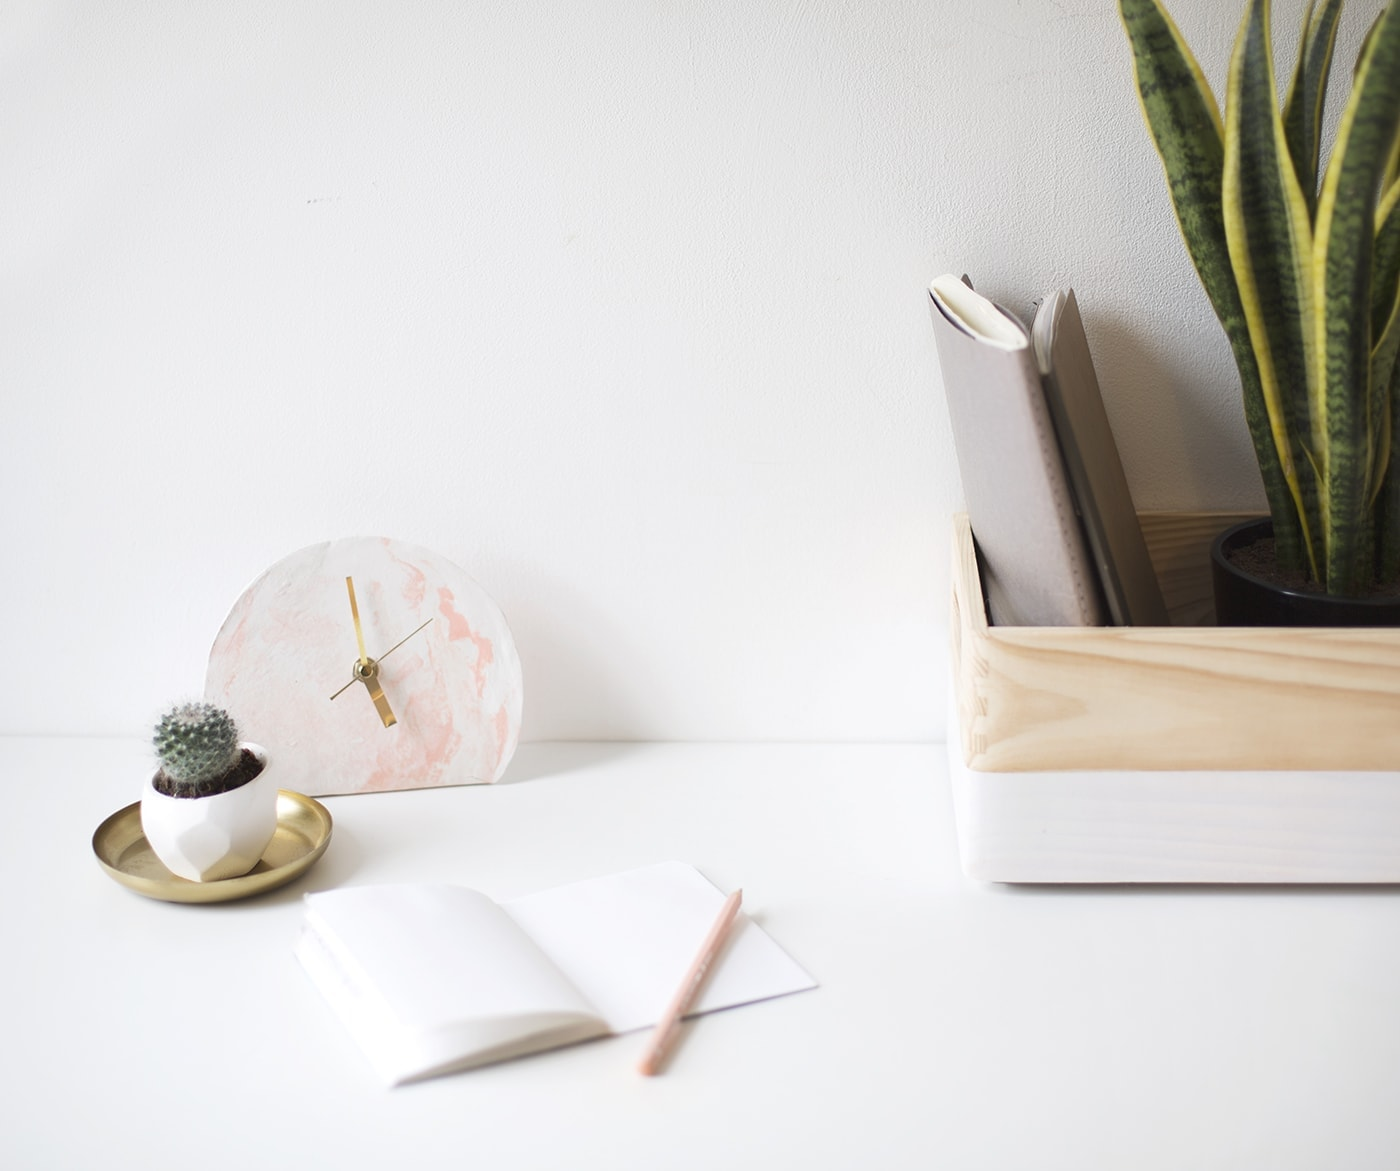 mini standing desk clock DIY | easy tutorial | polymer clay